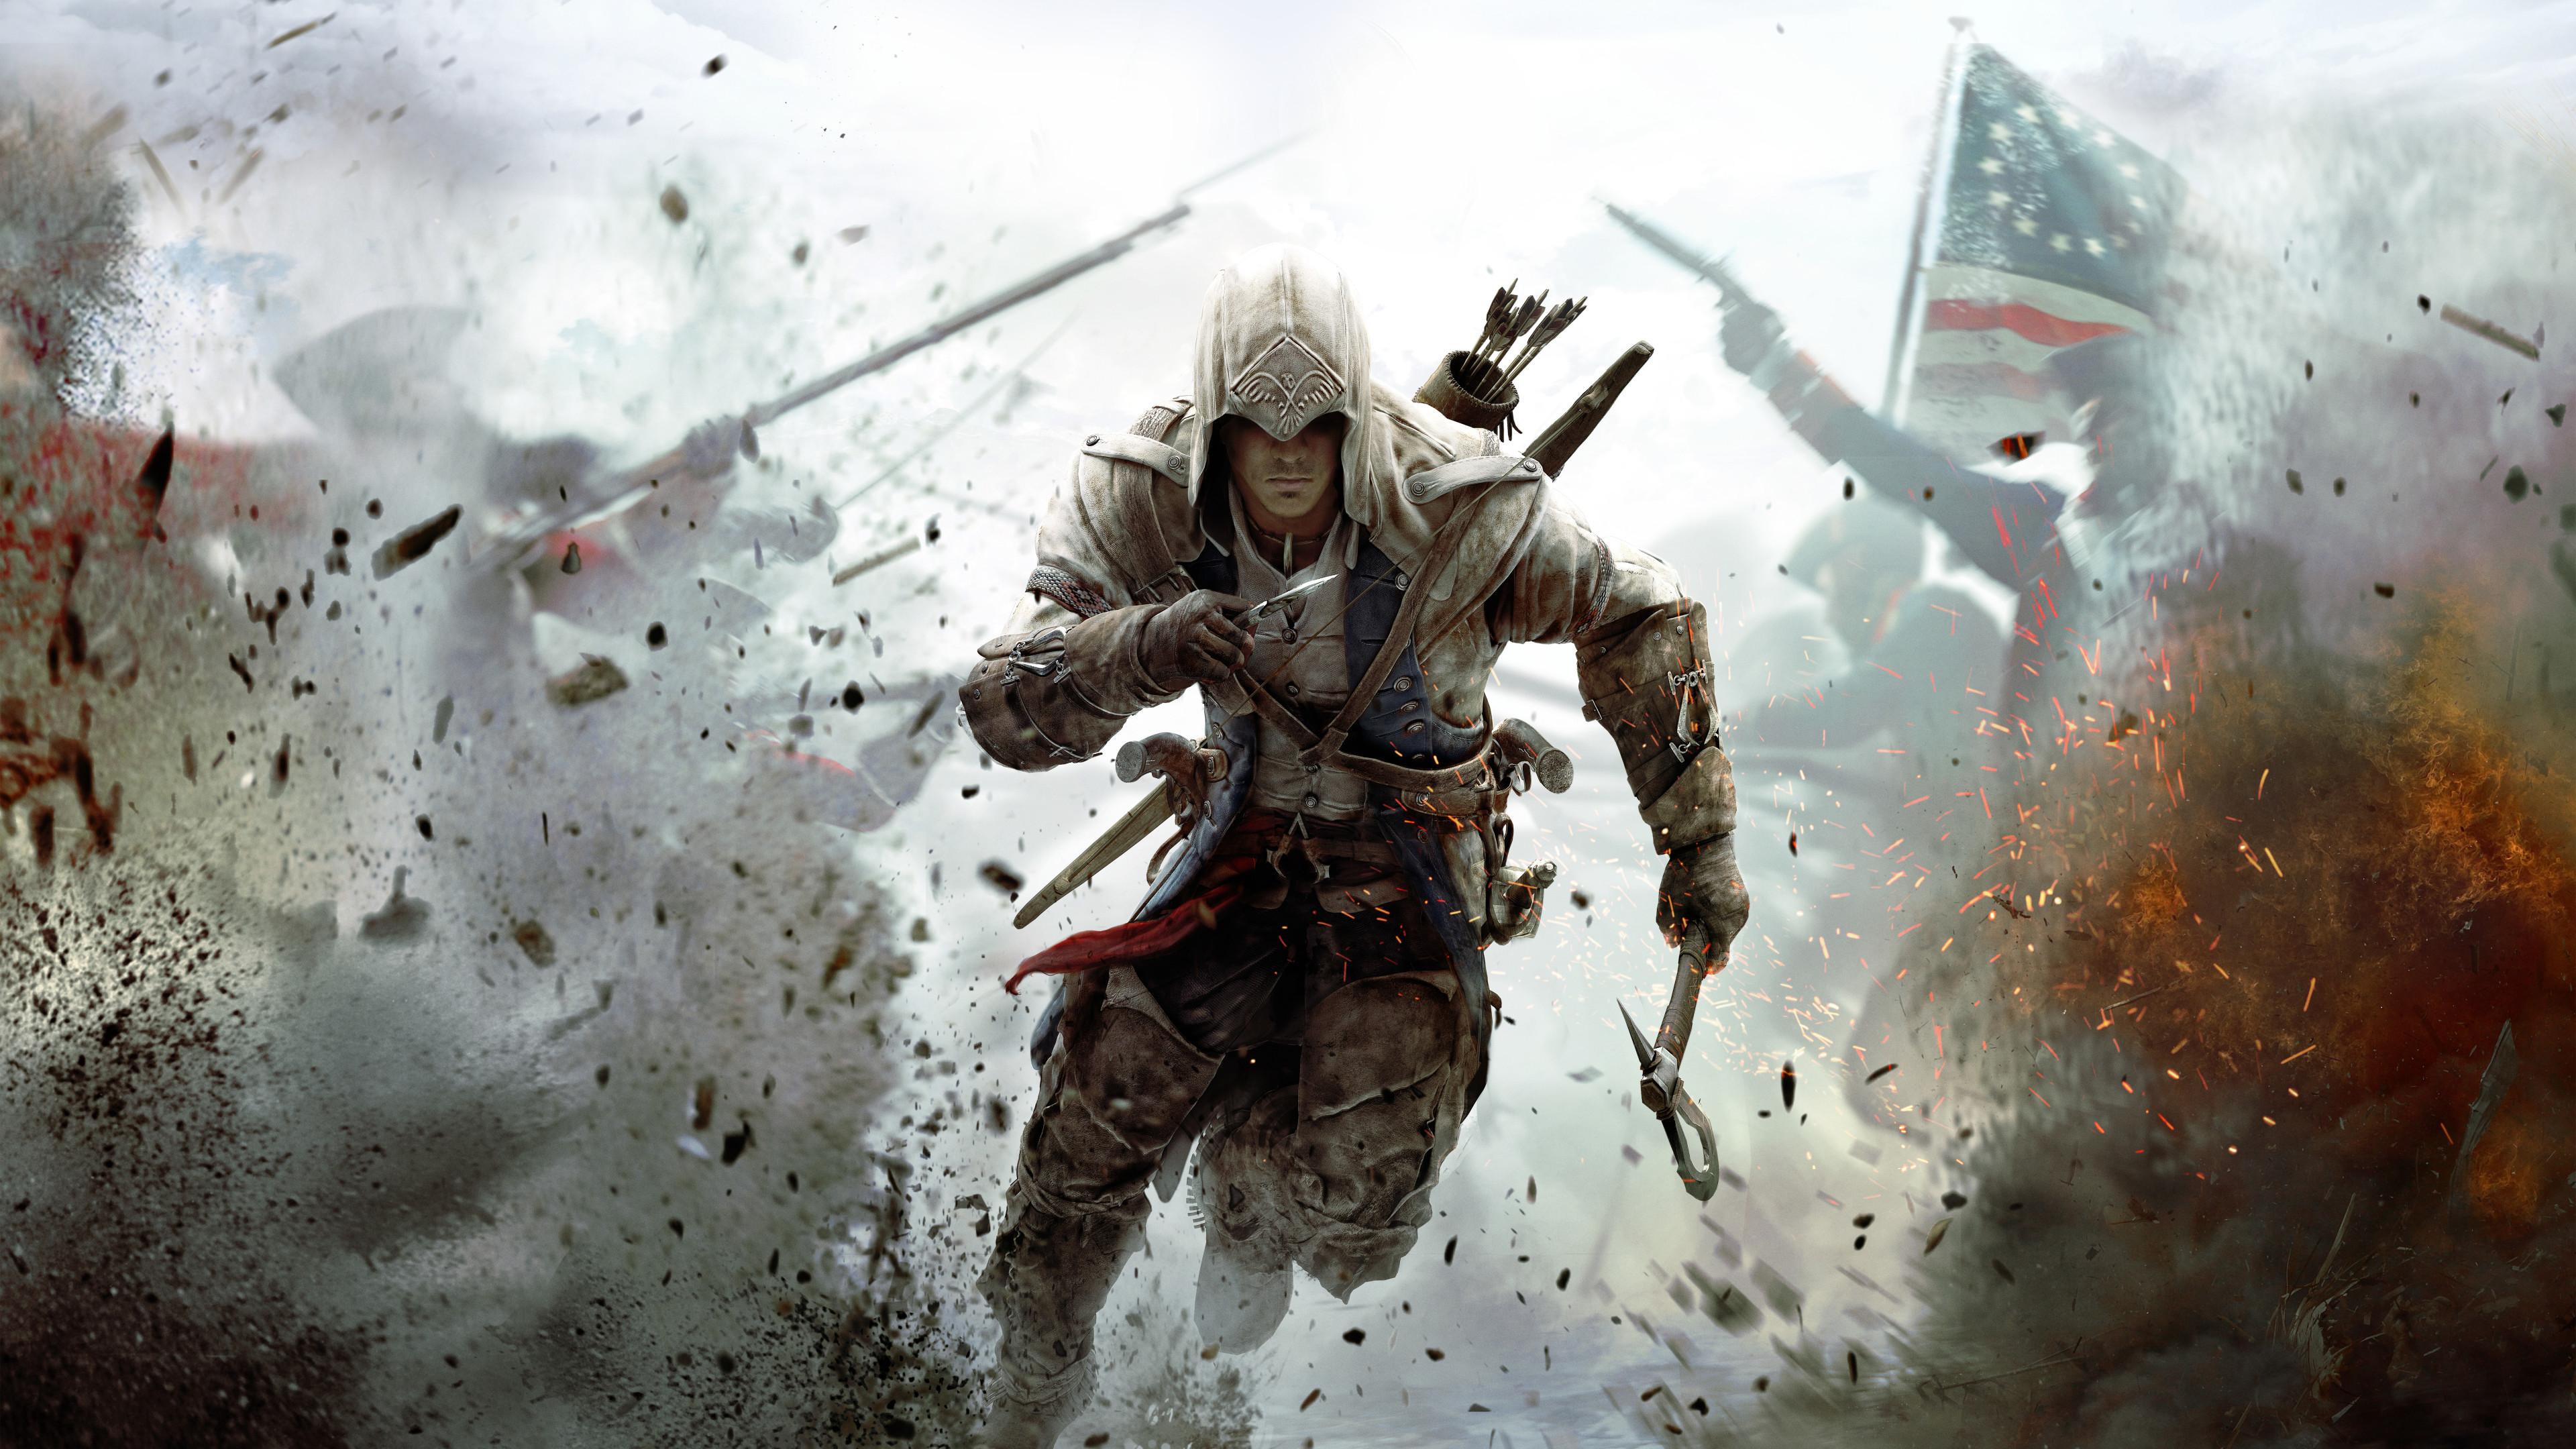 assassins creed 3 10k lk 3840x2160 1 - Assassins Creed 3 - Assassins Creed wallpapers 4k, Assassins Creed 3 4k wallpaper